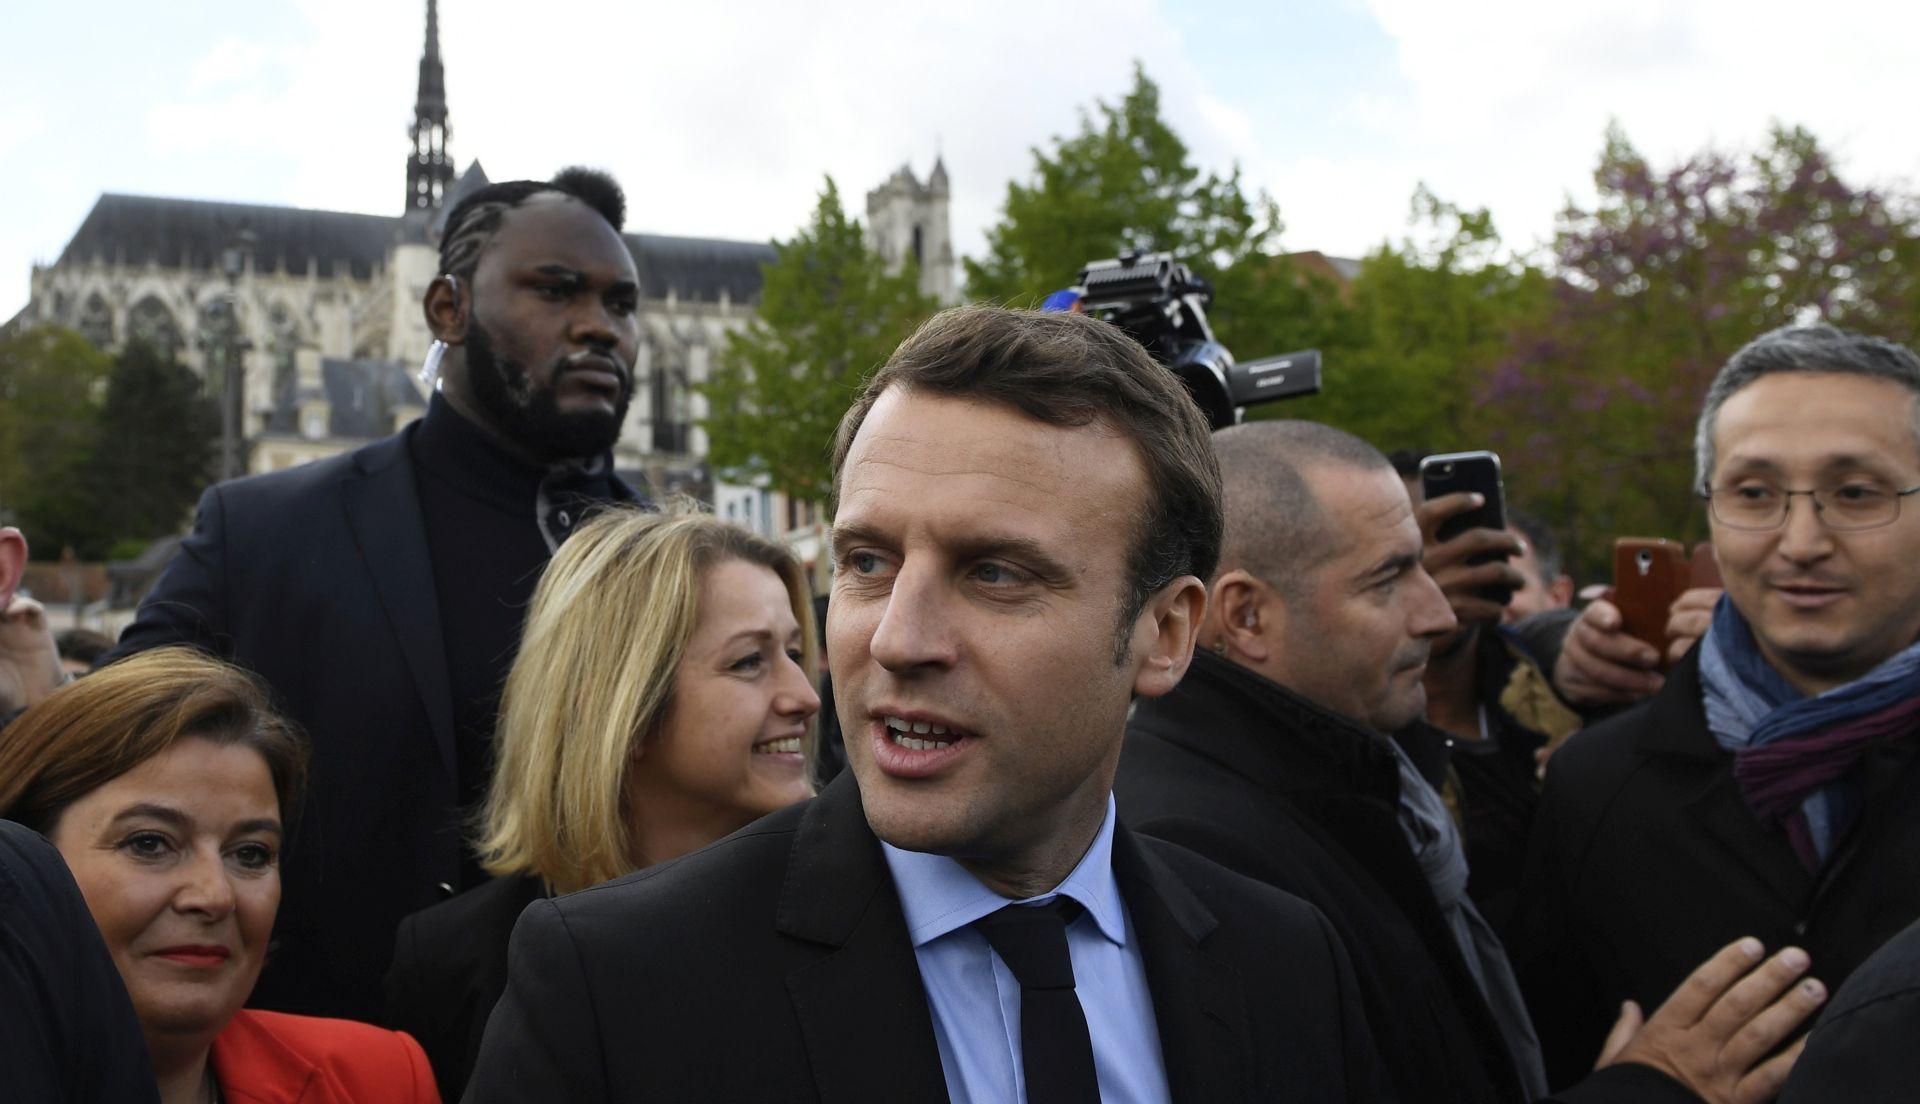 Macron i Le Pen razmjenjuju udarce u Parizu na Dan rada